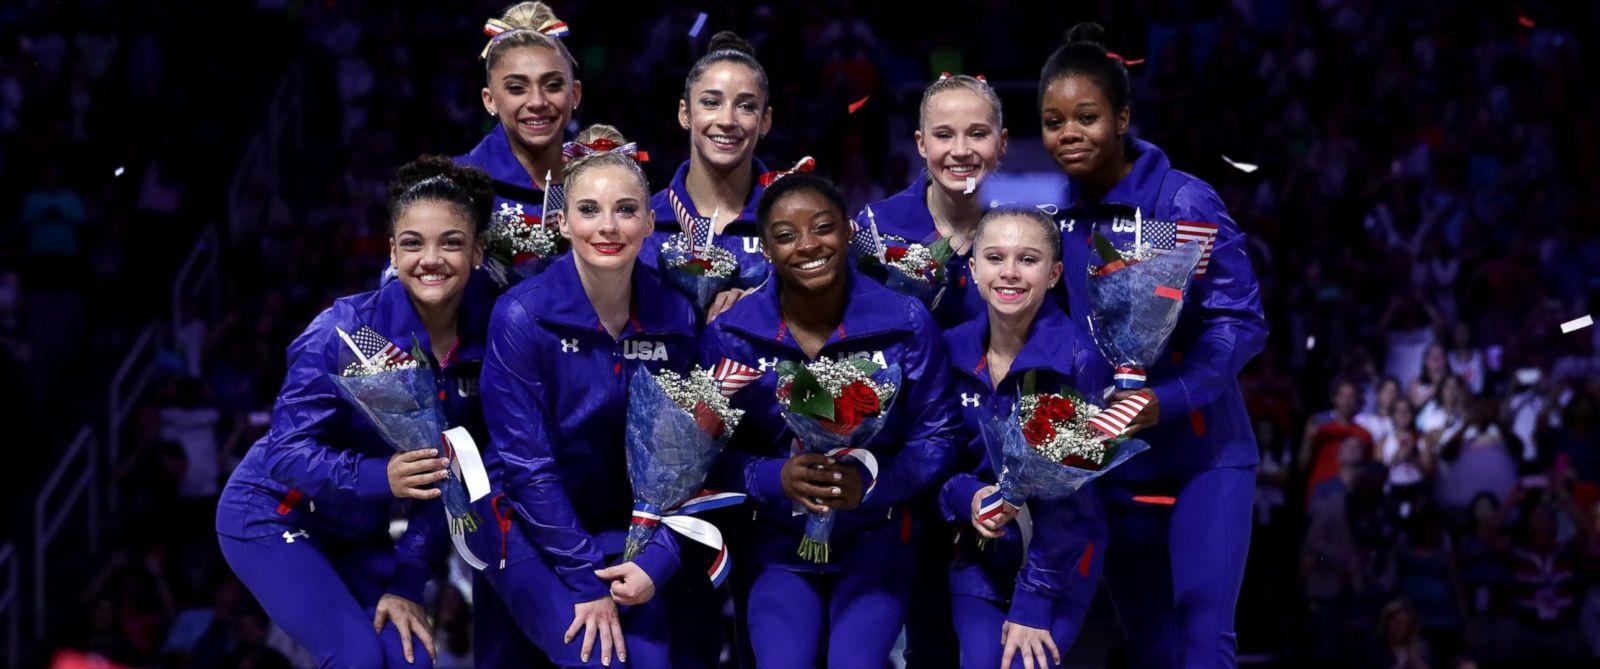 rising stars gymnastics meet 2016 olympics